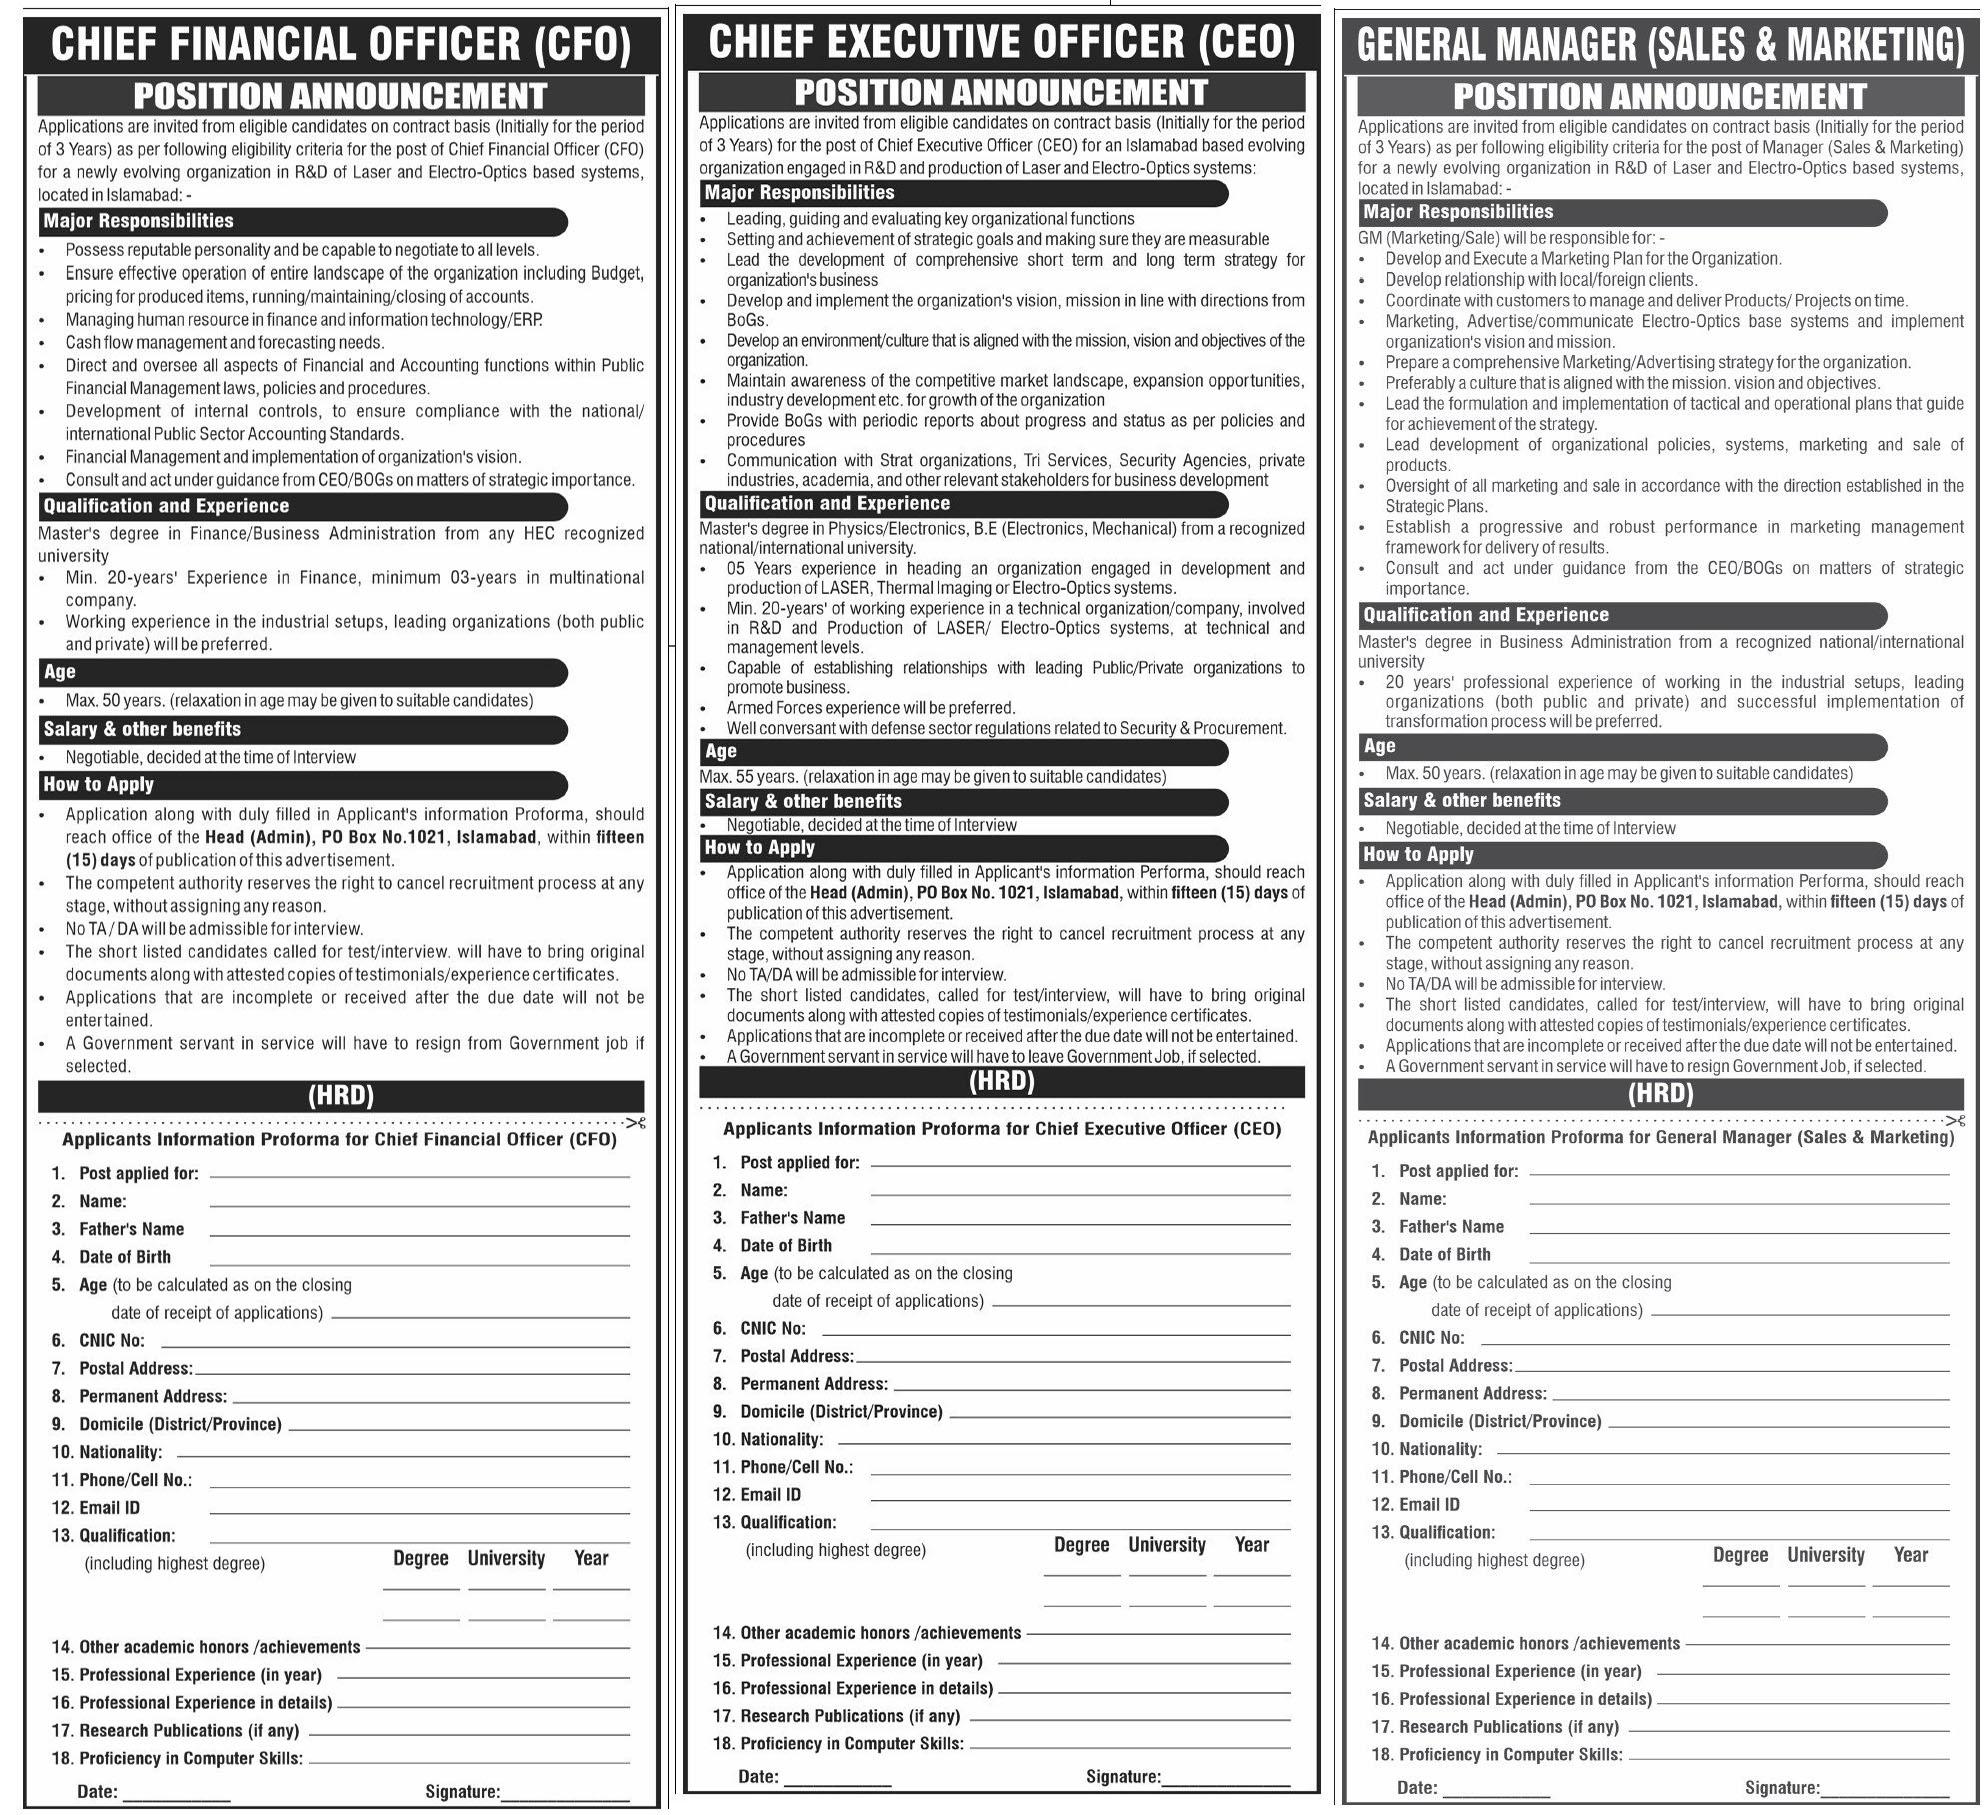 Government Sector Organization PO Box 1021 Islamabad Jobs 2021